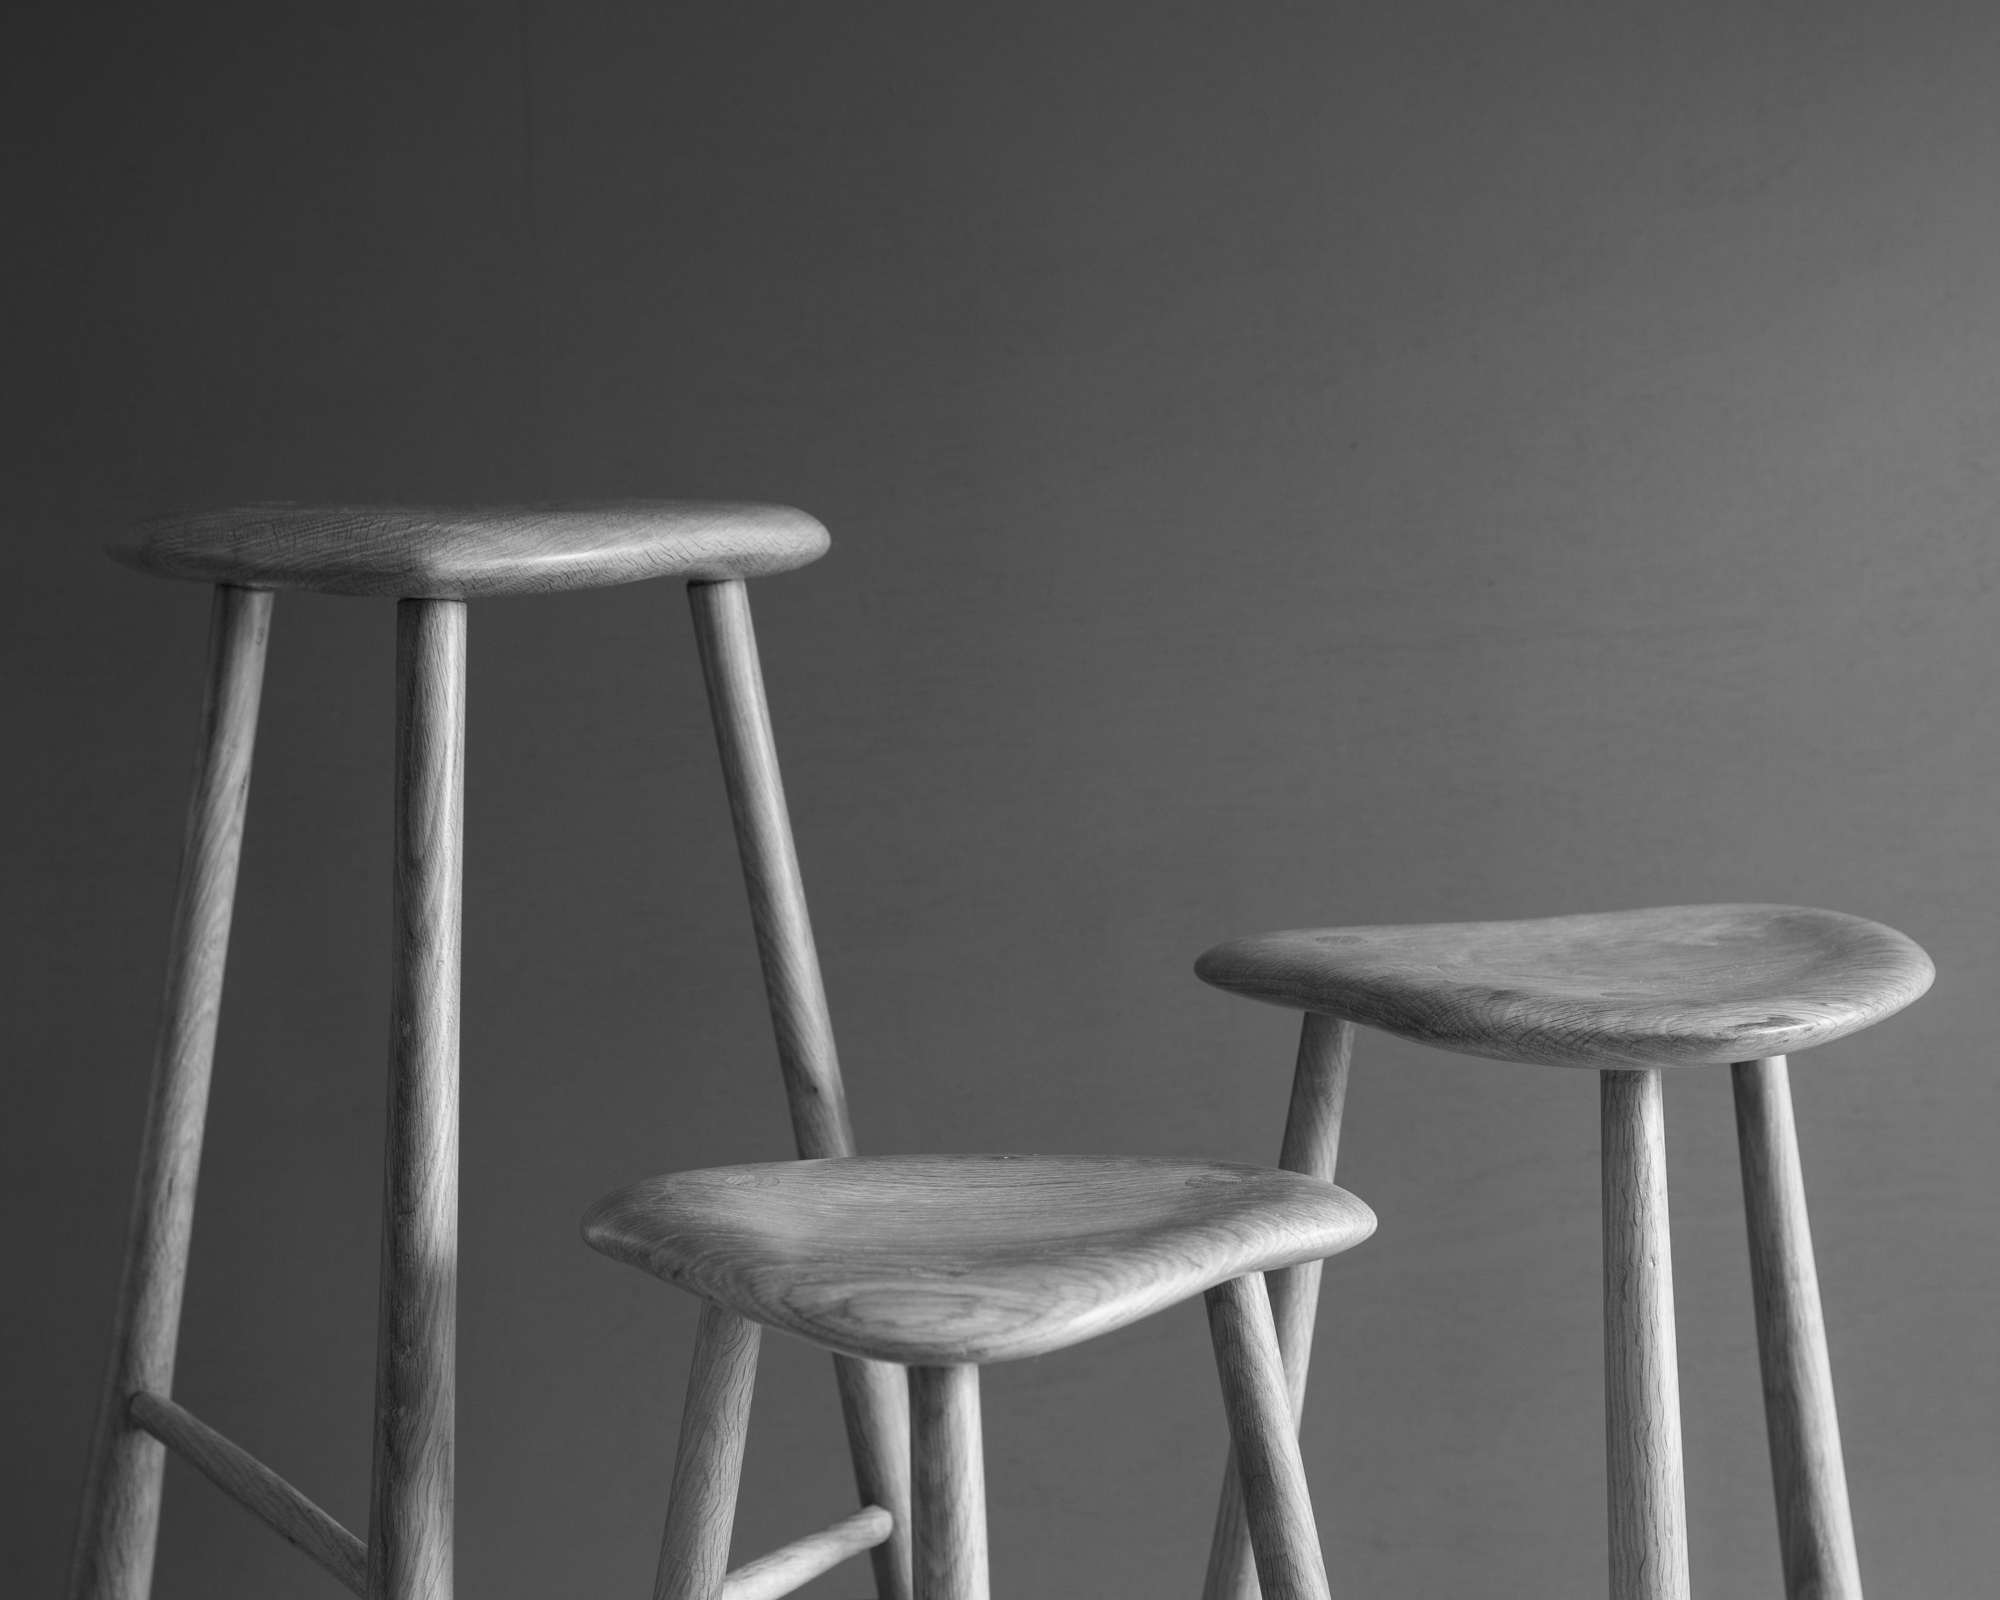 stools-card-30.jpg